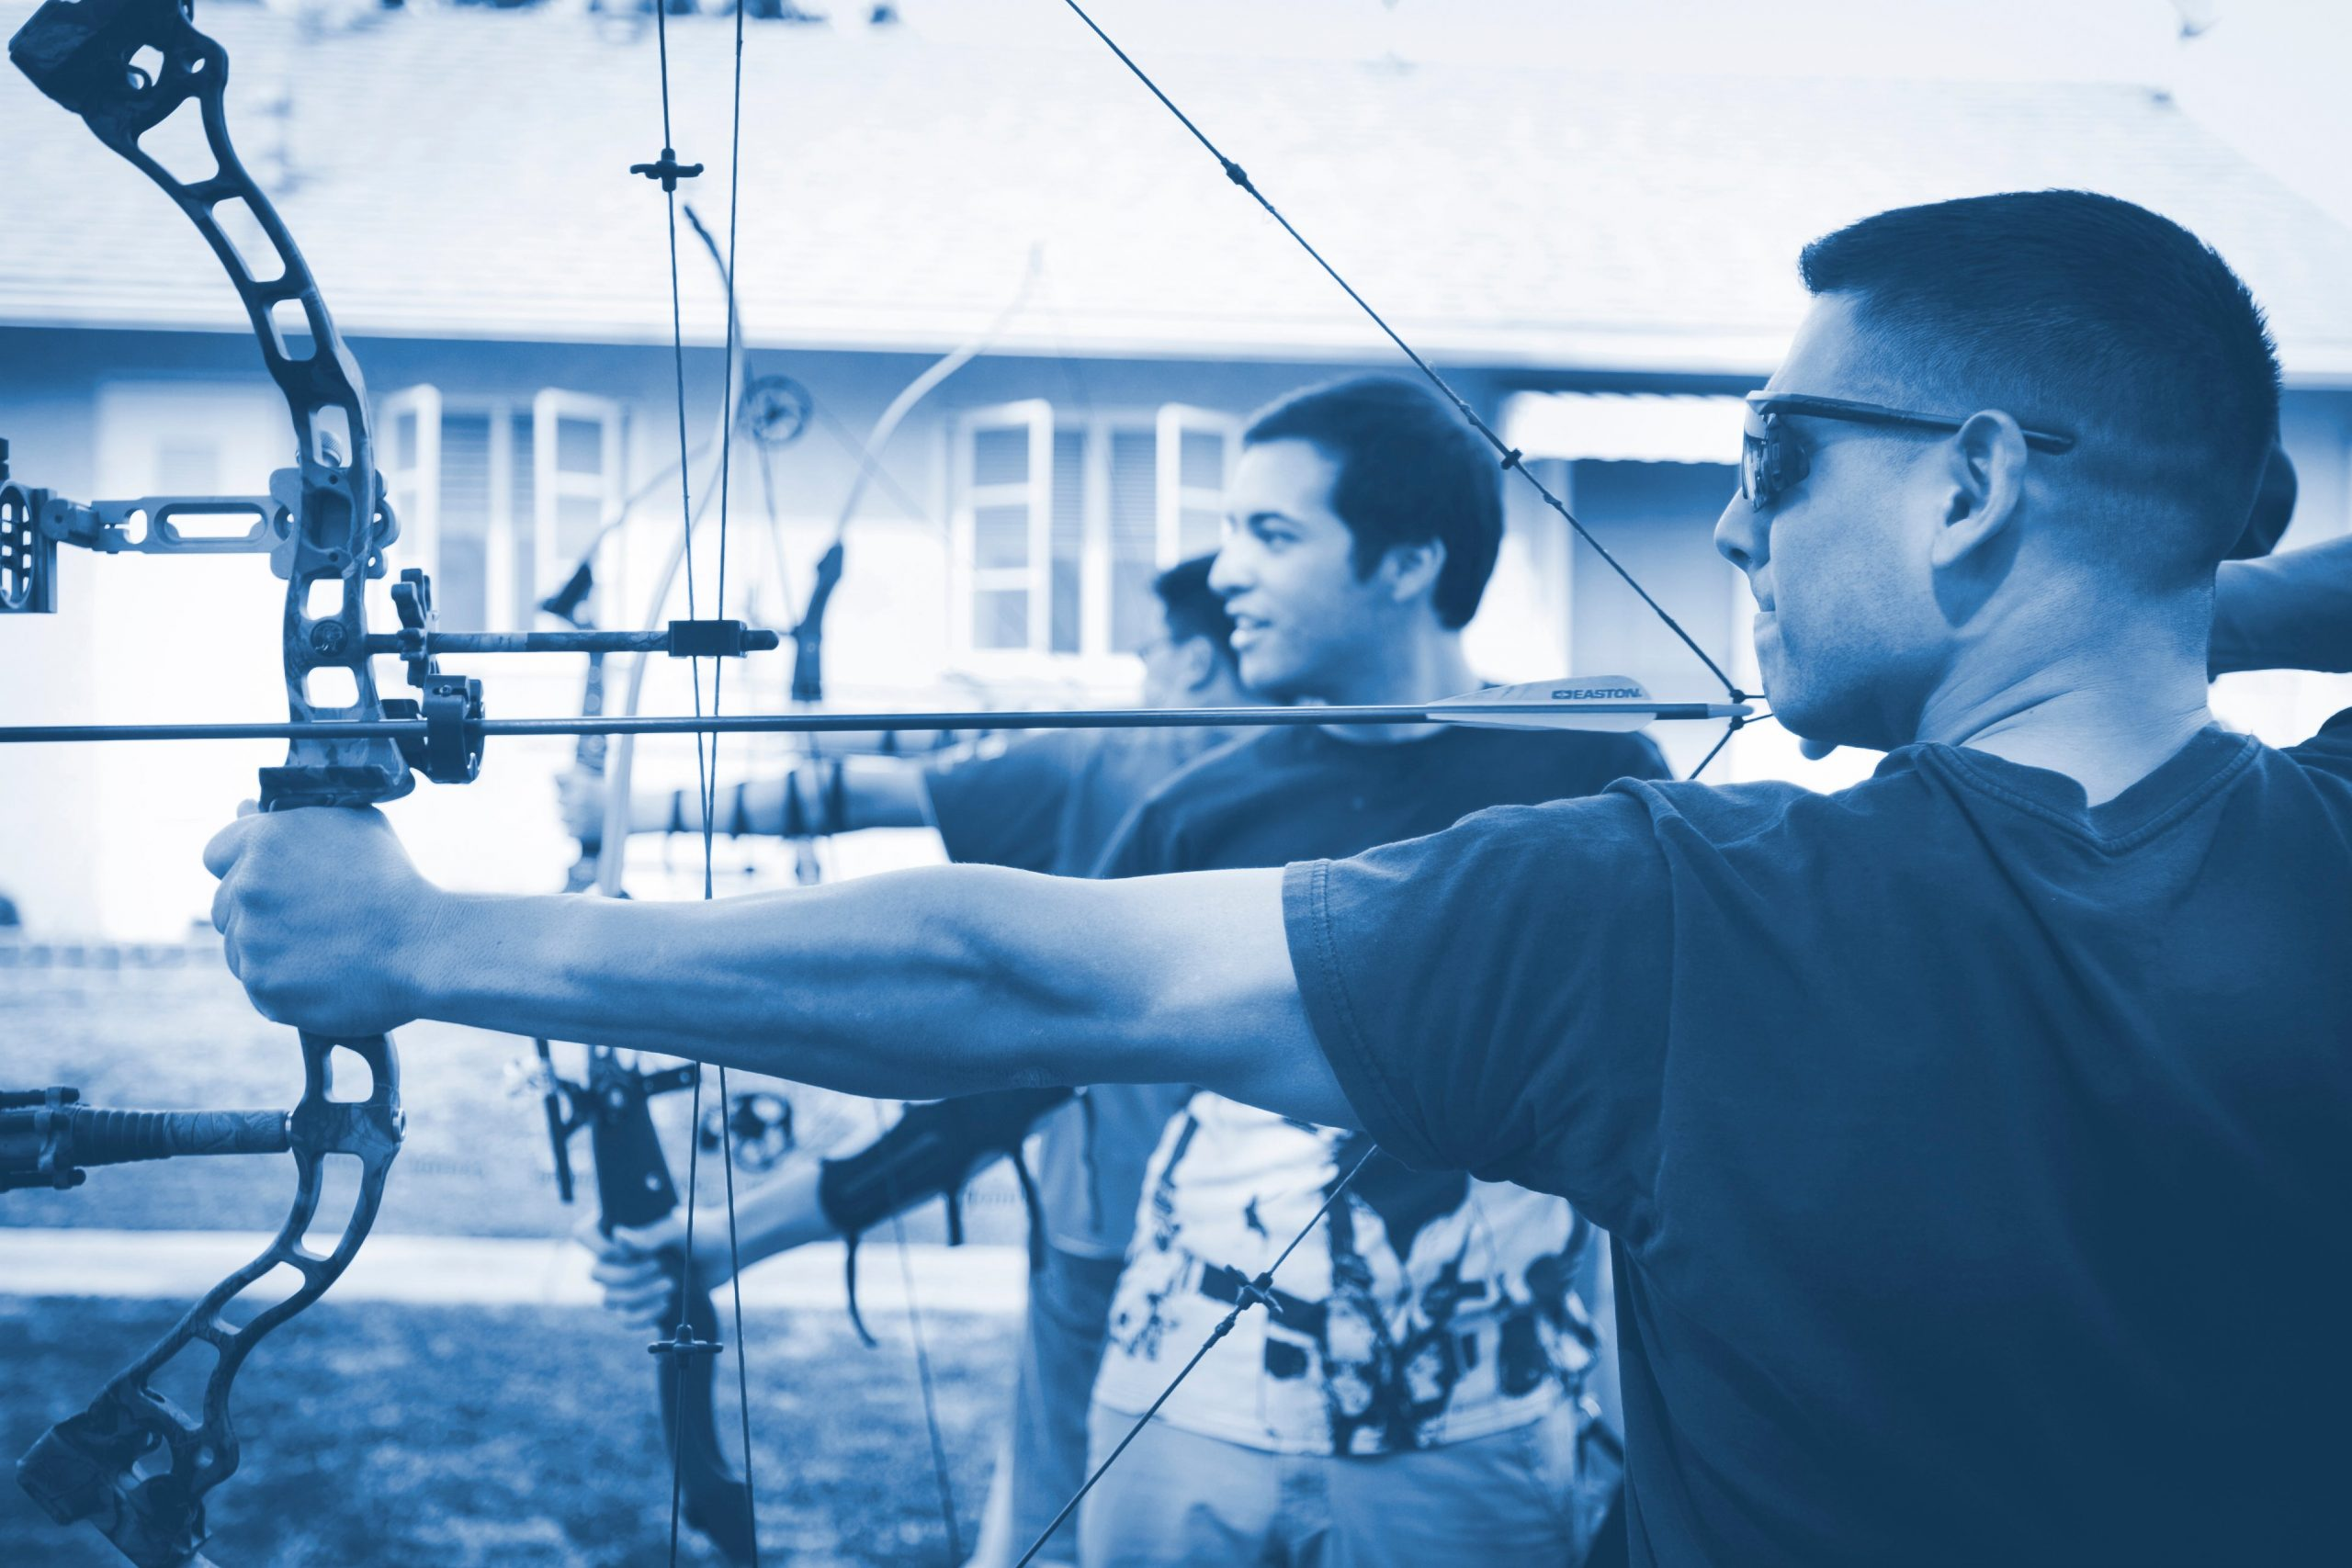 Archery for hobby